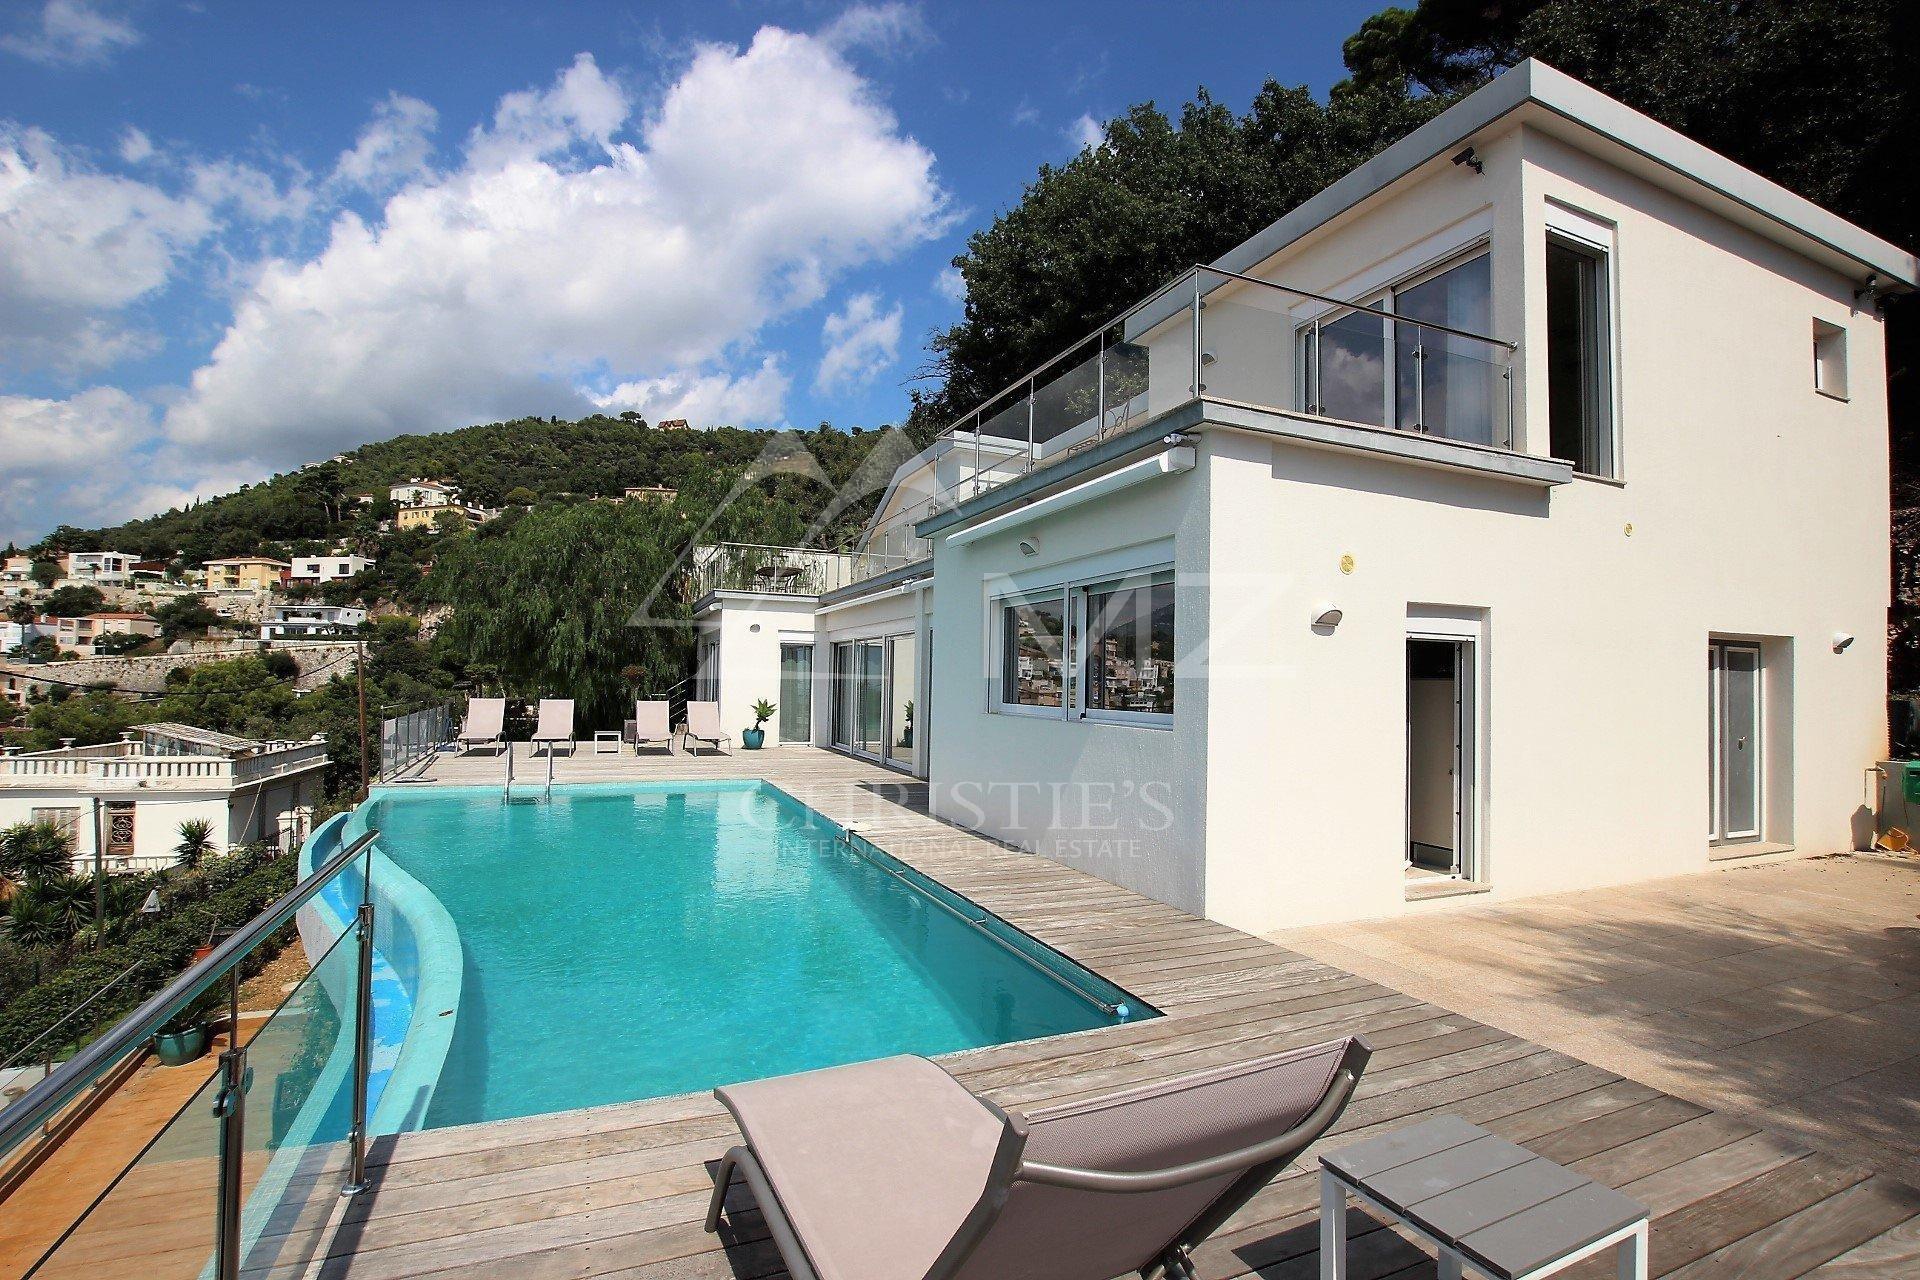 Villa in Nice, Provence-Alpes-Côte d'Azur, France 1